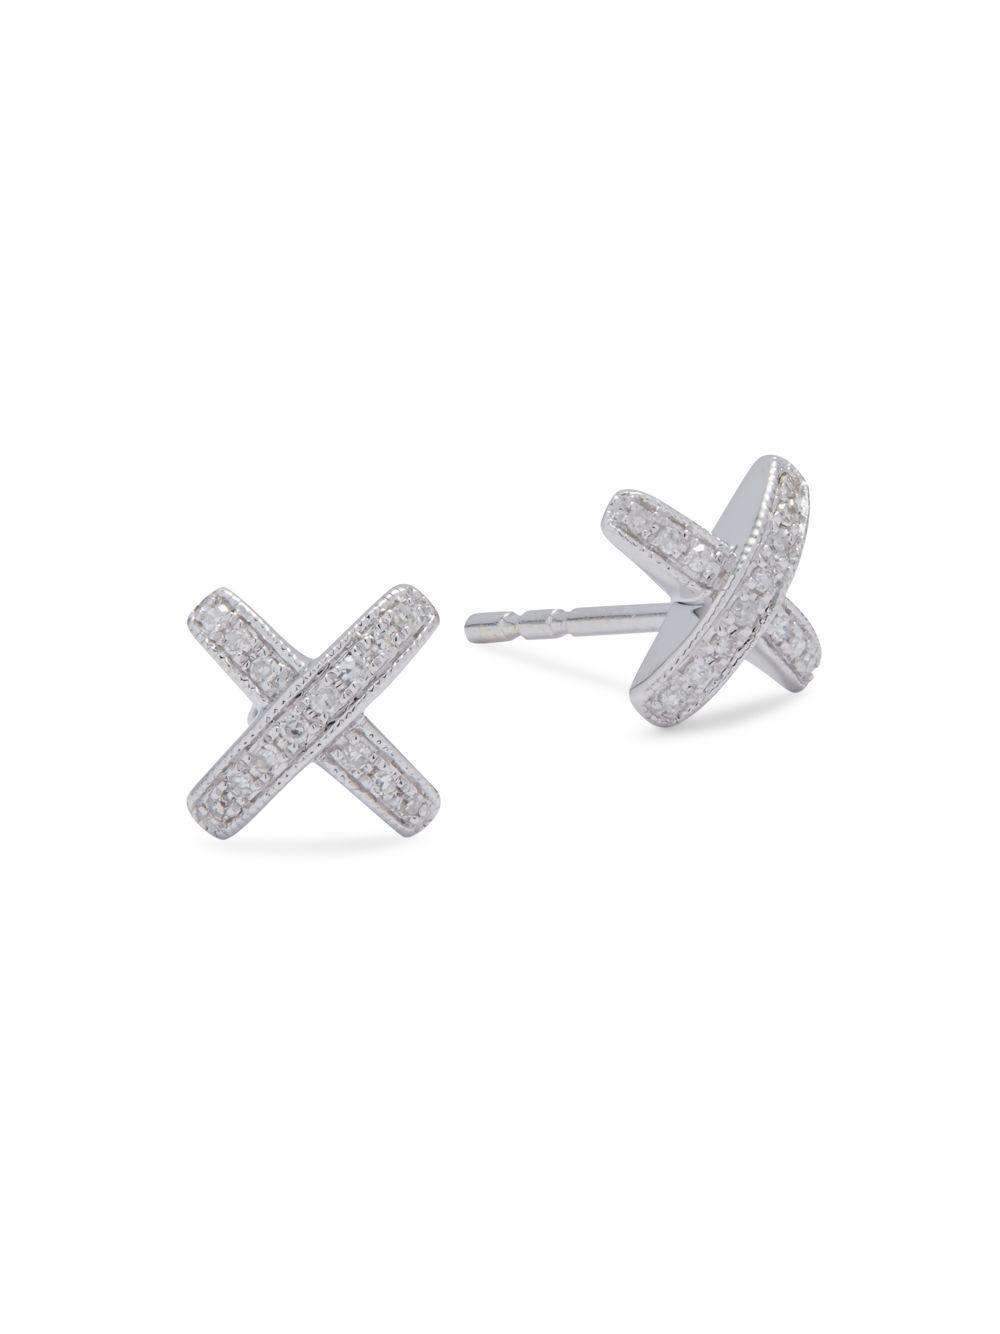 Kc Designs Women S Metallic Diamond 14k White Gold X Shaped Stud Earrings